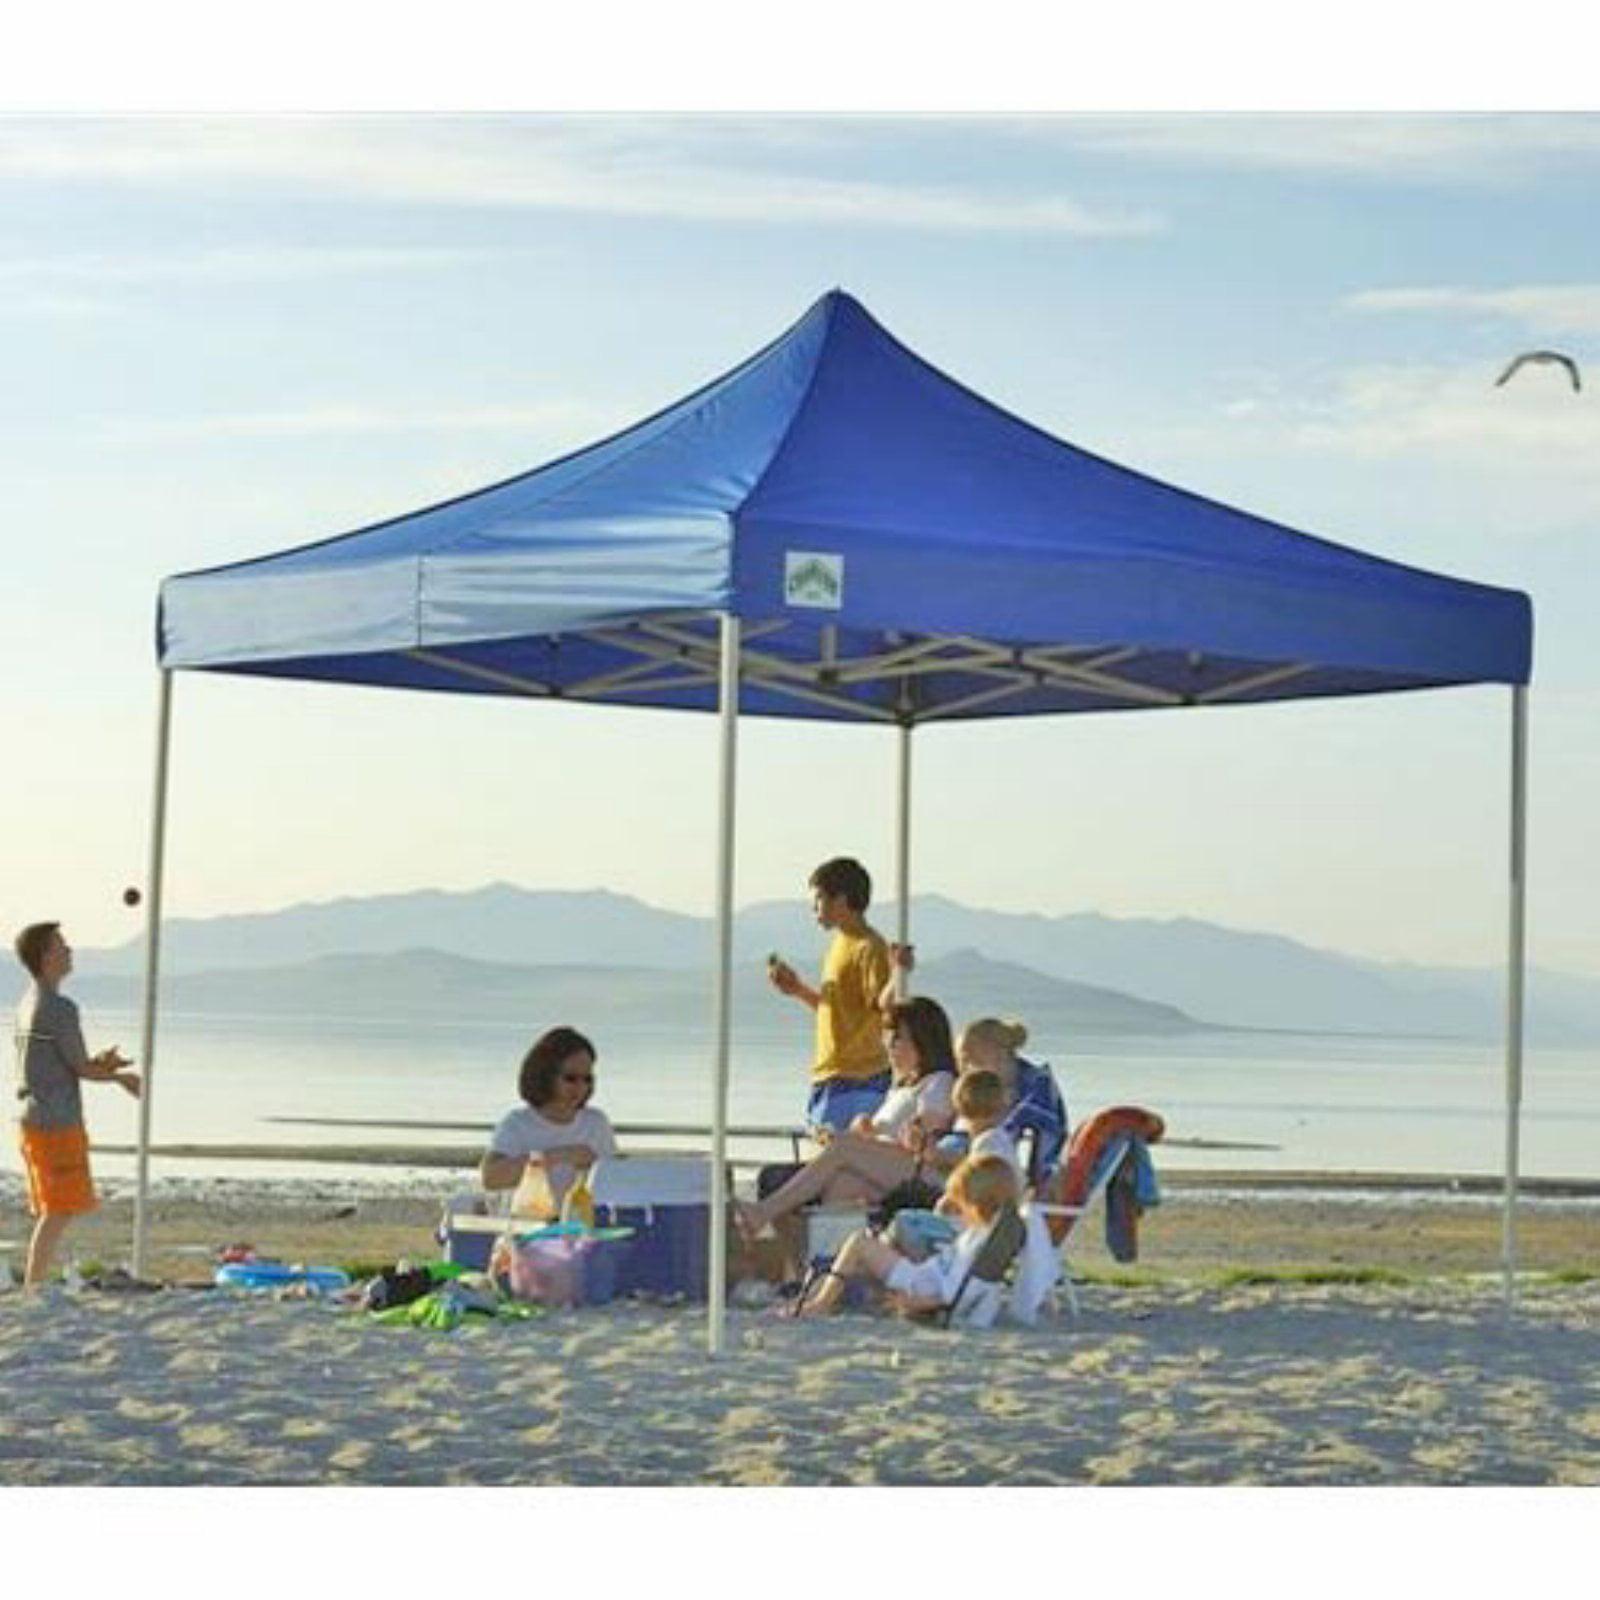 Caravan Sports 8 x 8 ft. Display-Shade 500 Denier Commercial Canopy